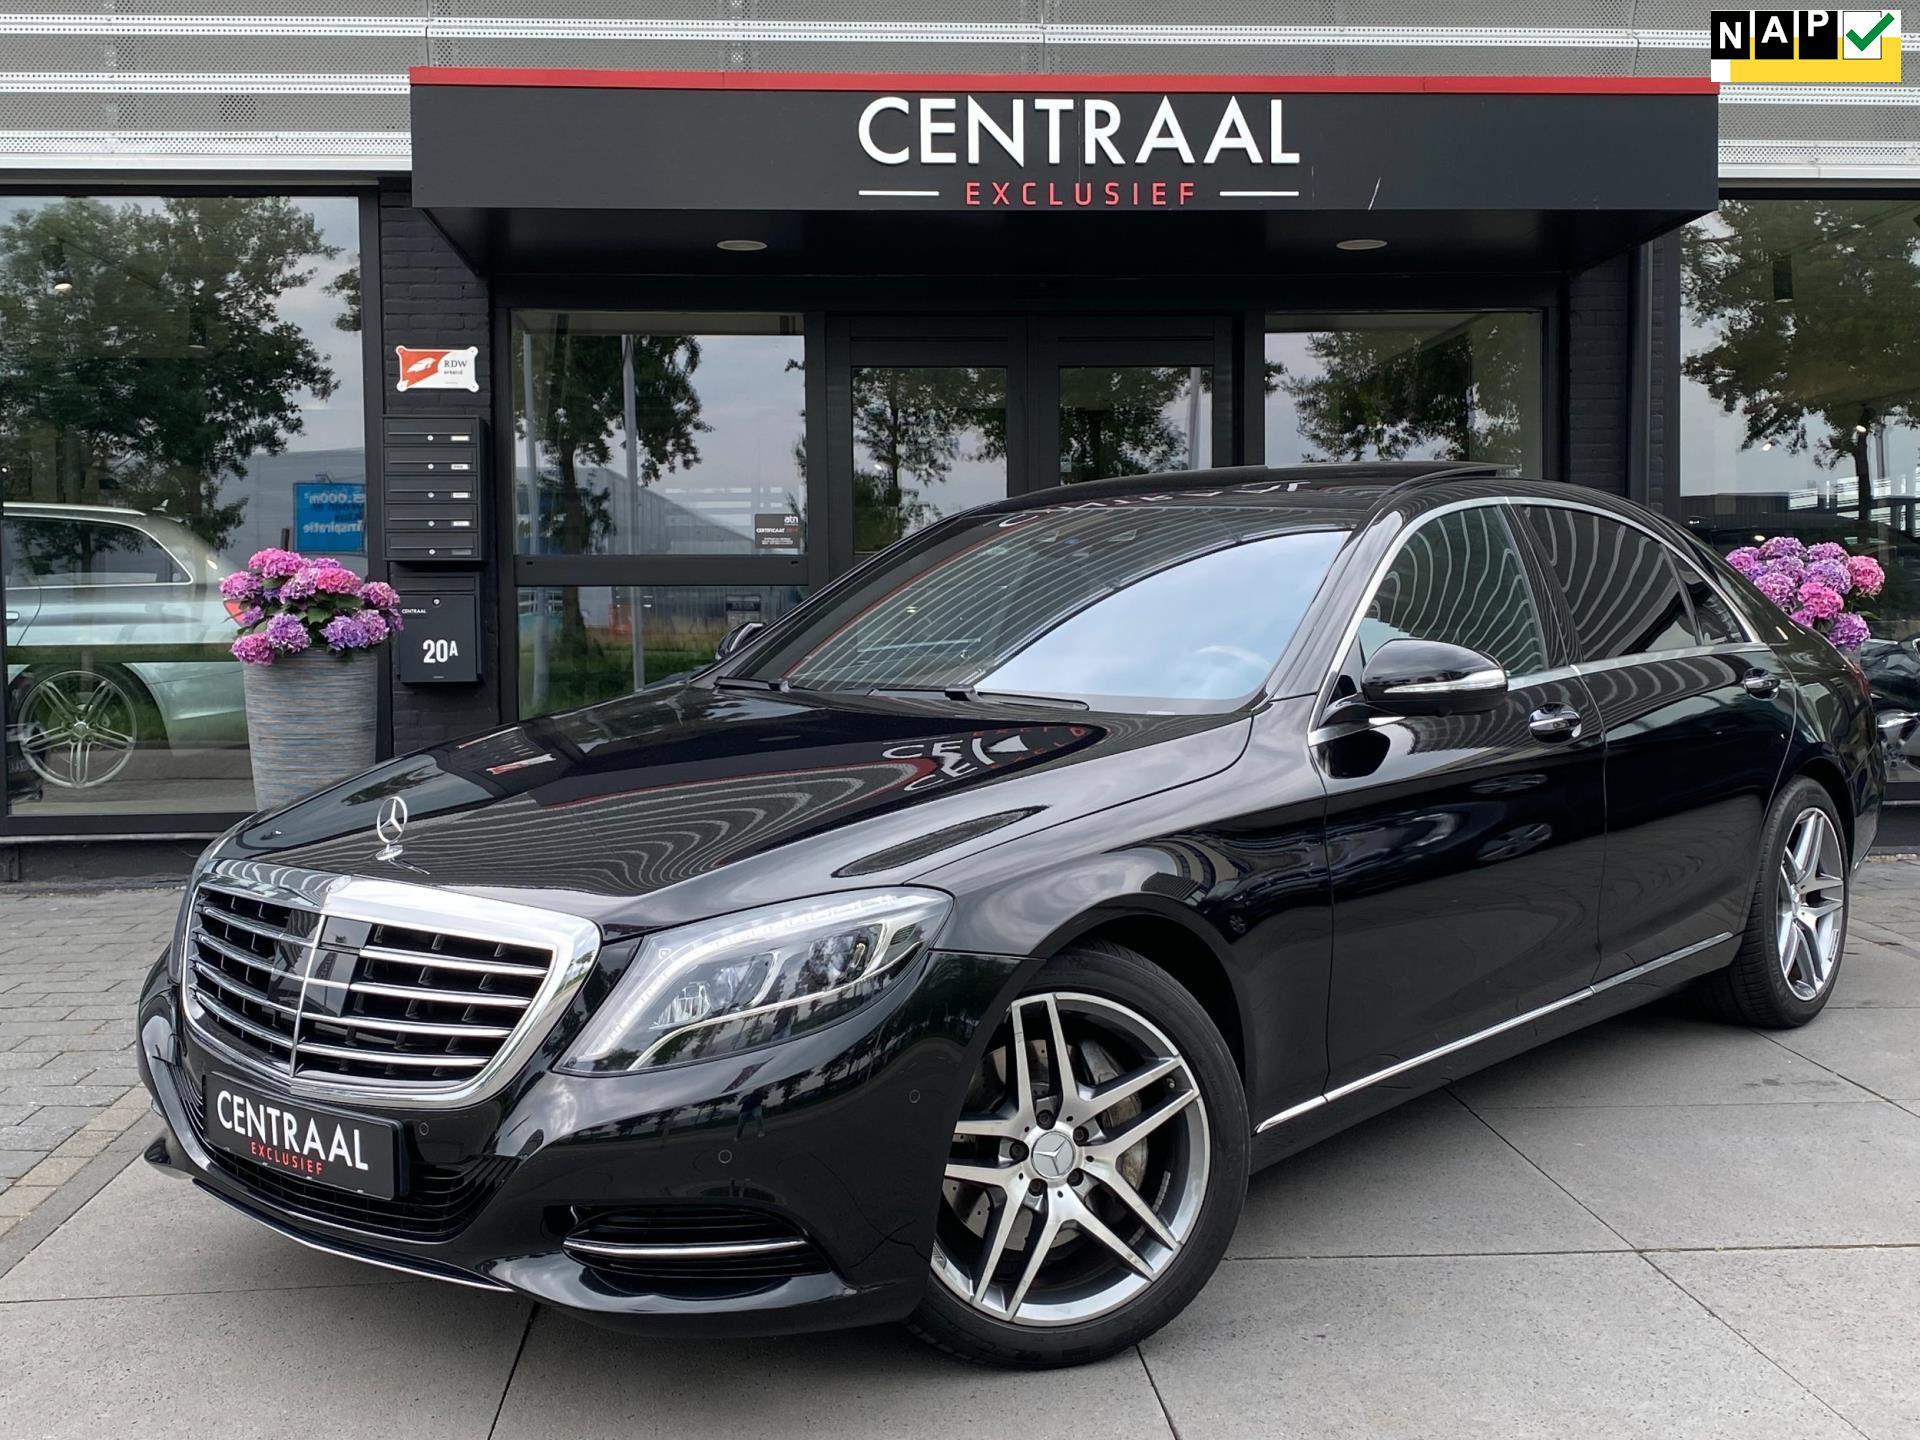 Mercedes-Benz S-klasse occasion - Centraal Exclusief B.V.